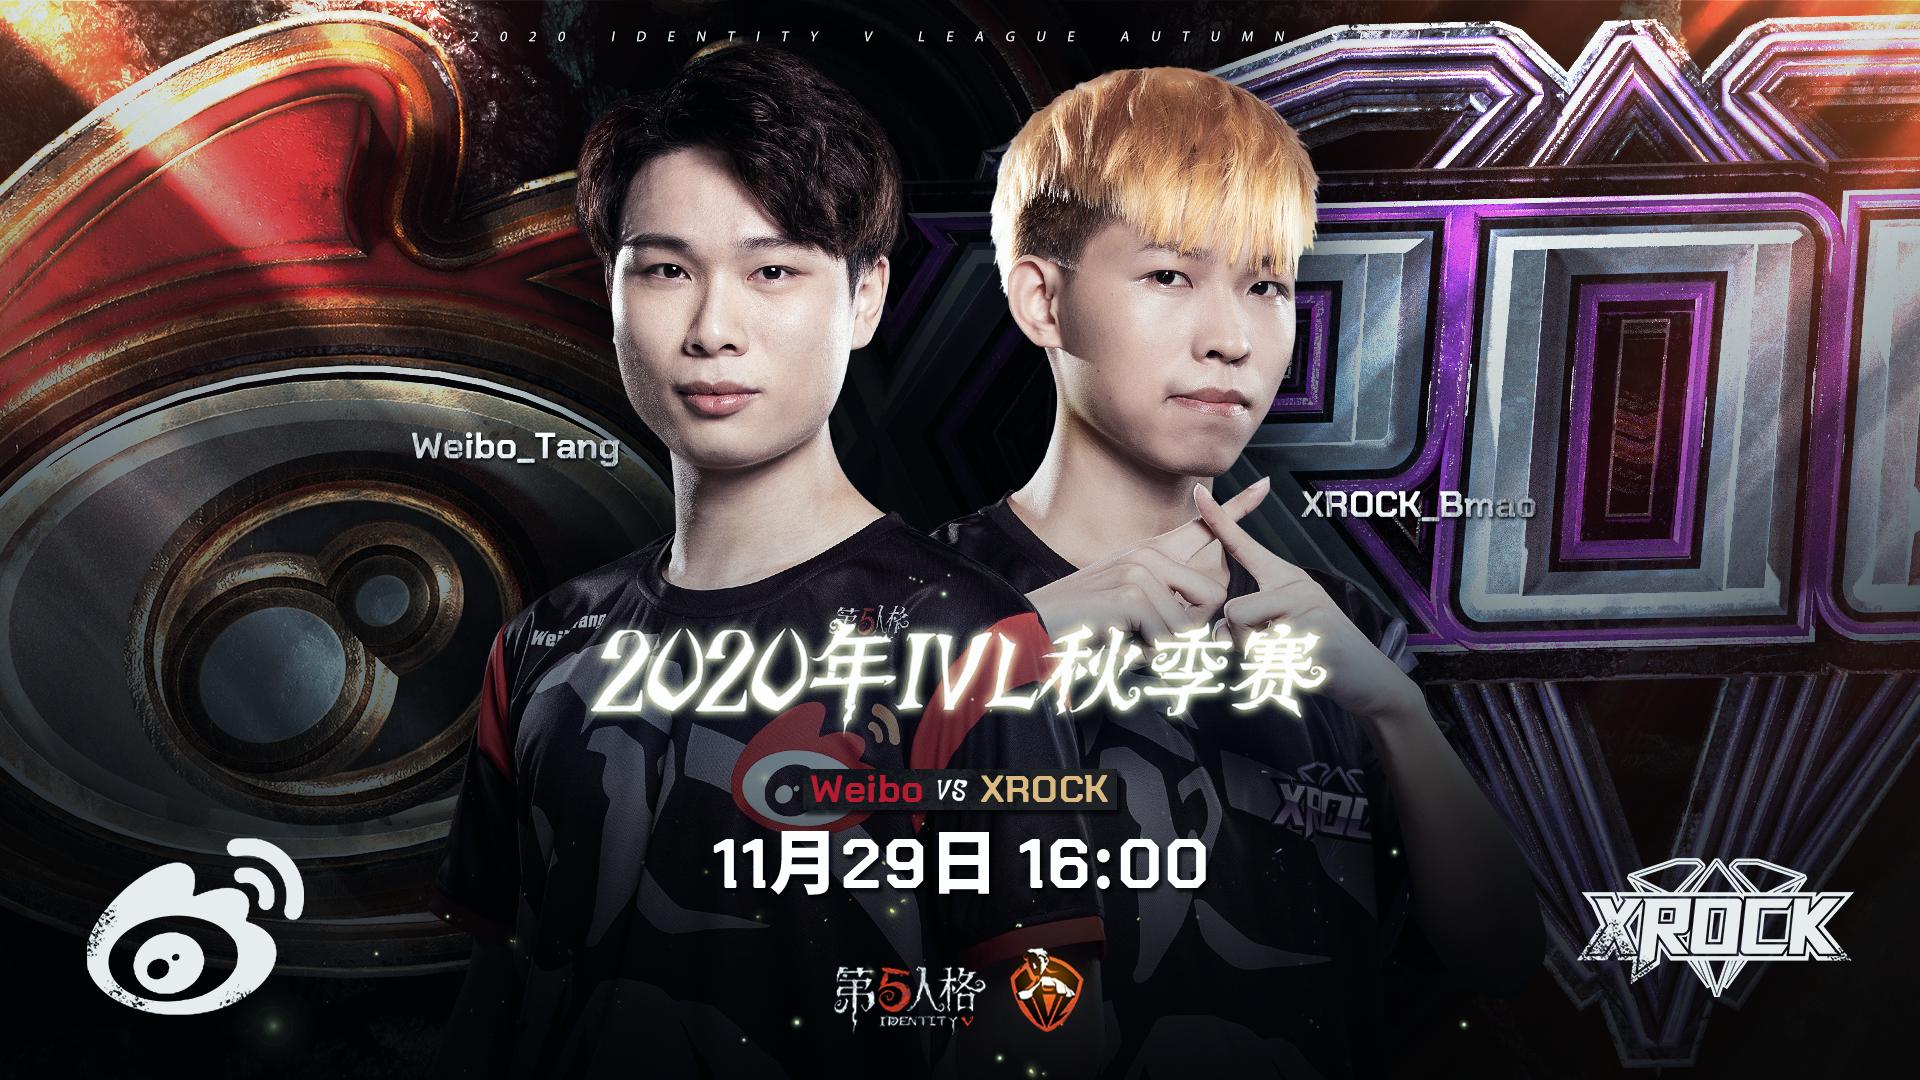 【2020IVL】秋季赛W4D5录像 WEIBO vs XROCK